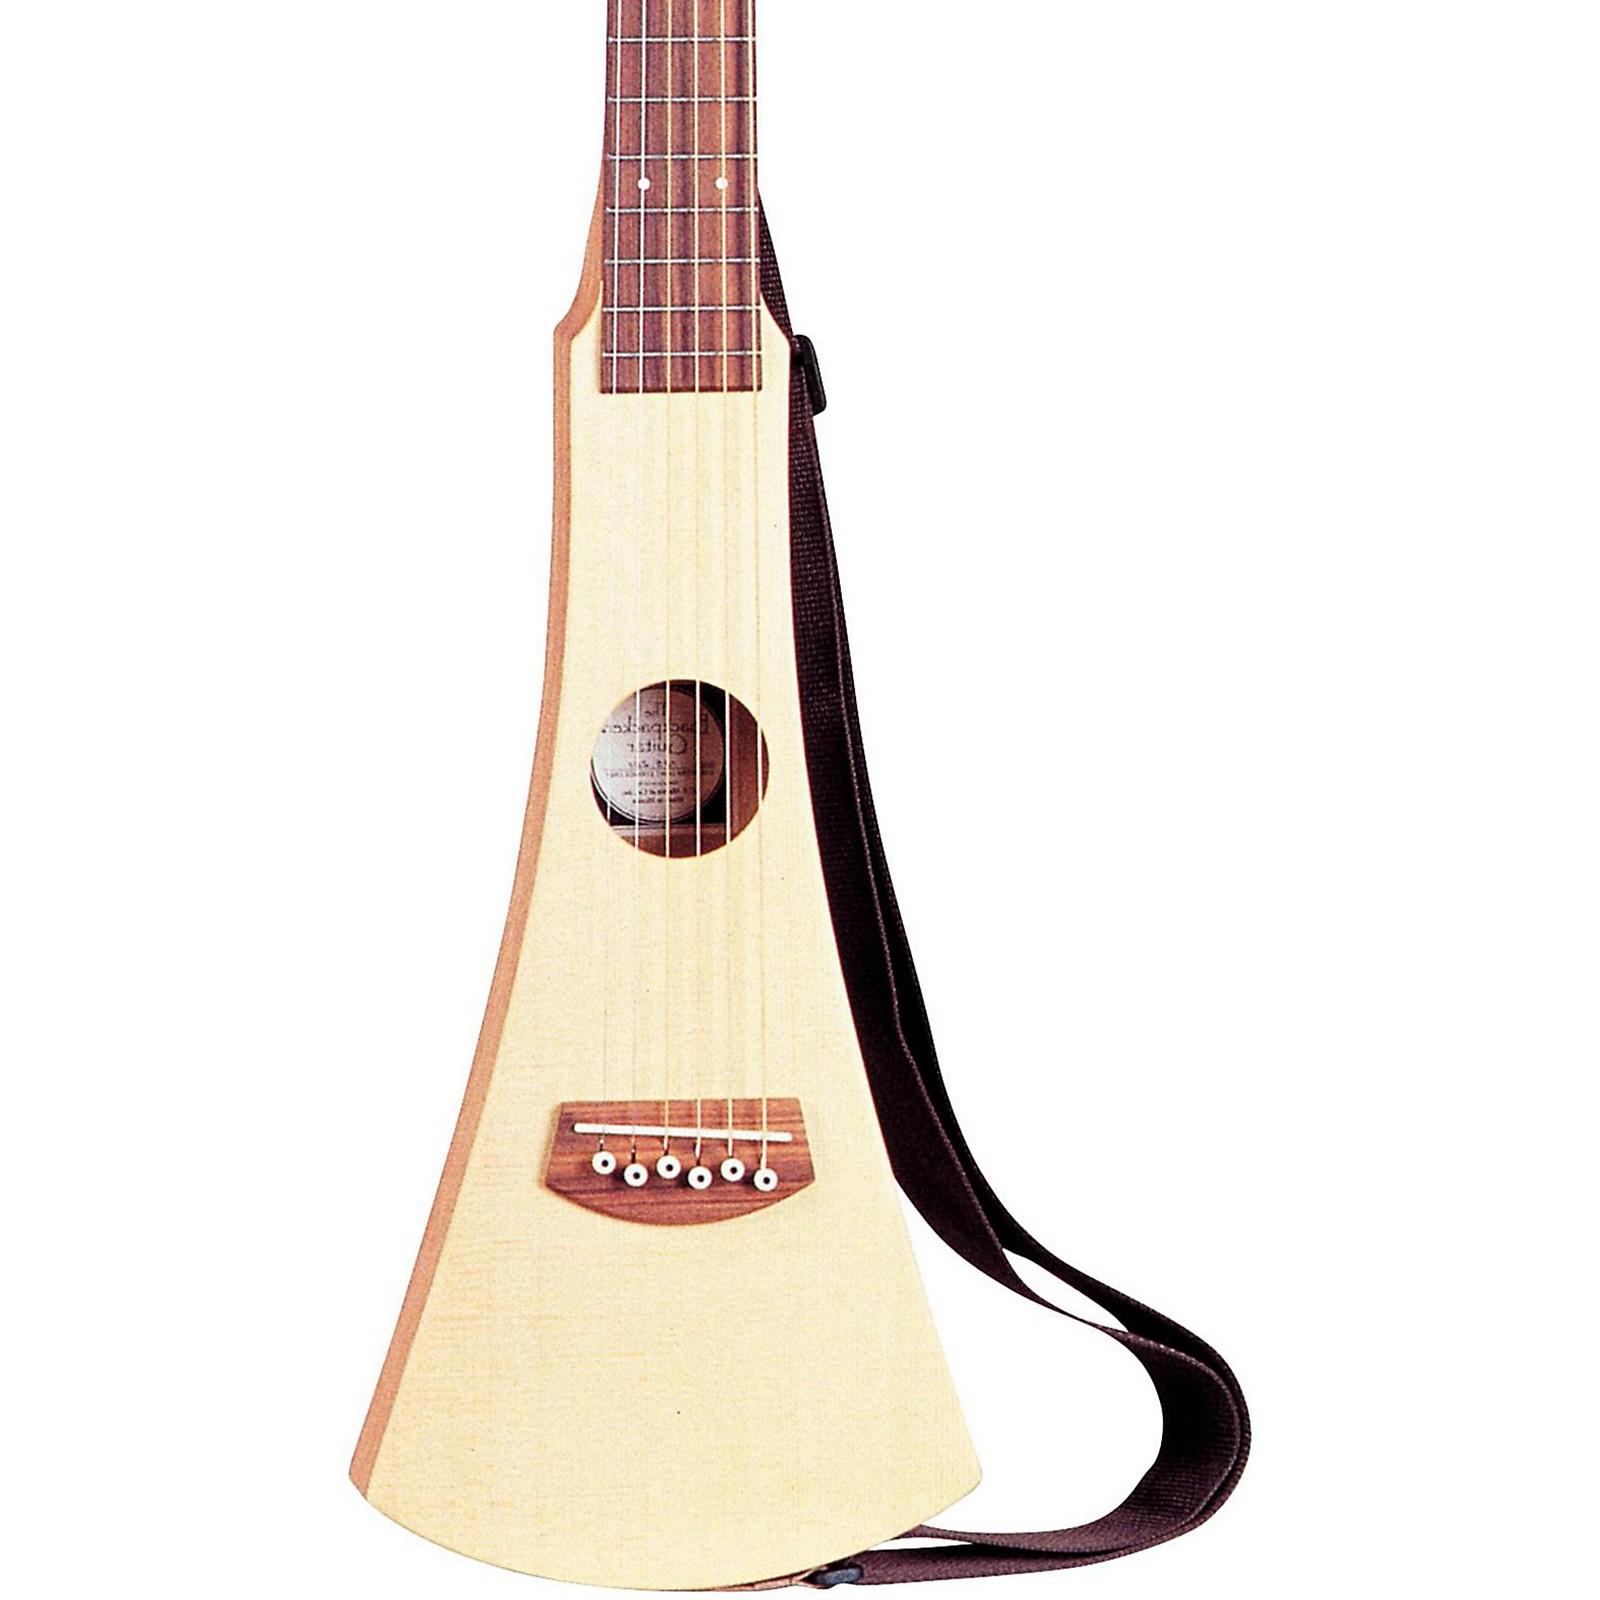 Martin Backpacker Steel String Left-Handed Acoustic Guitar